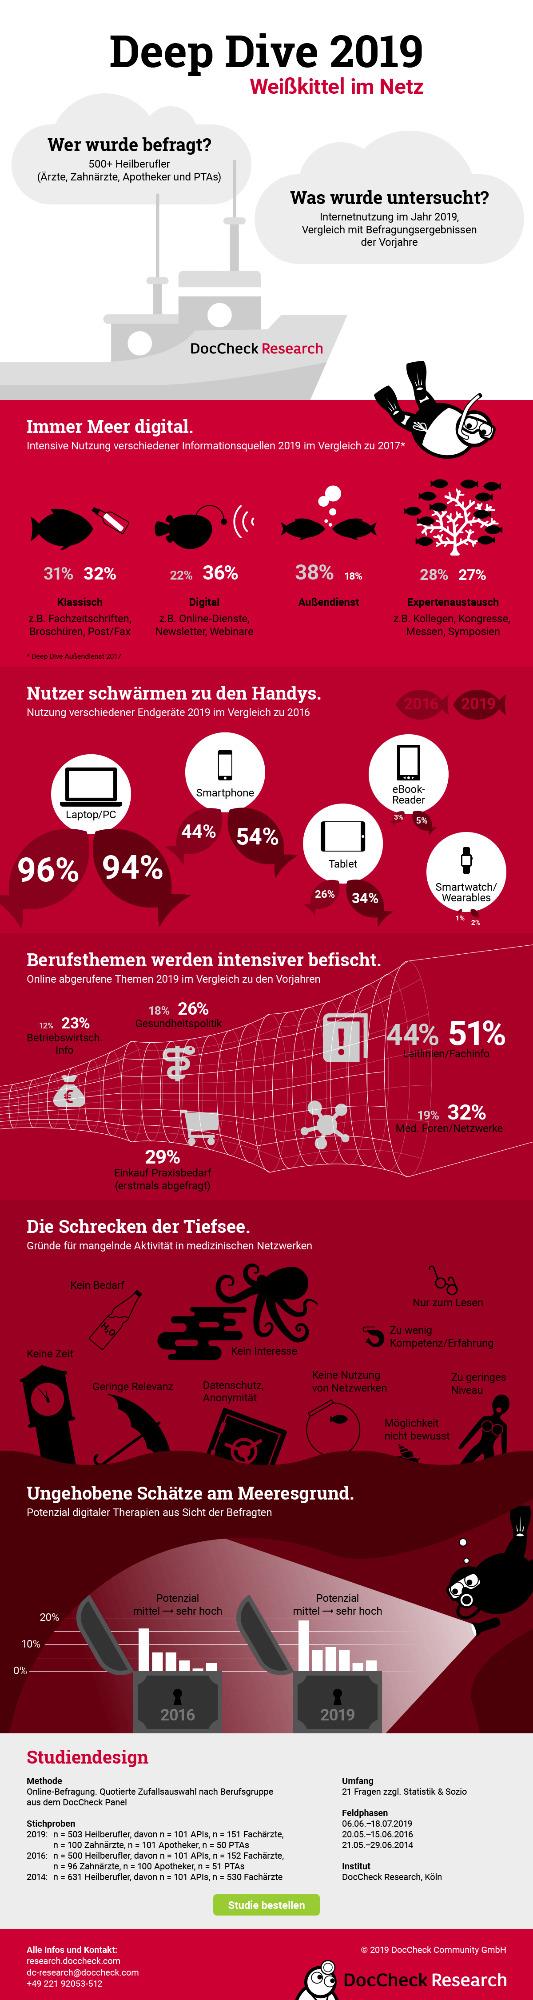 infografik-deepdive-internet-2019_origin